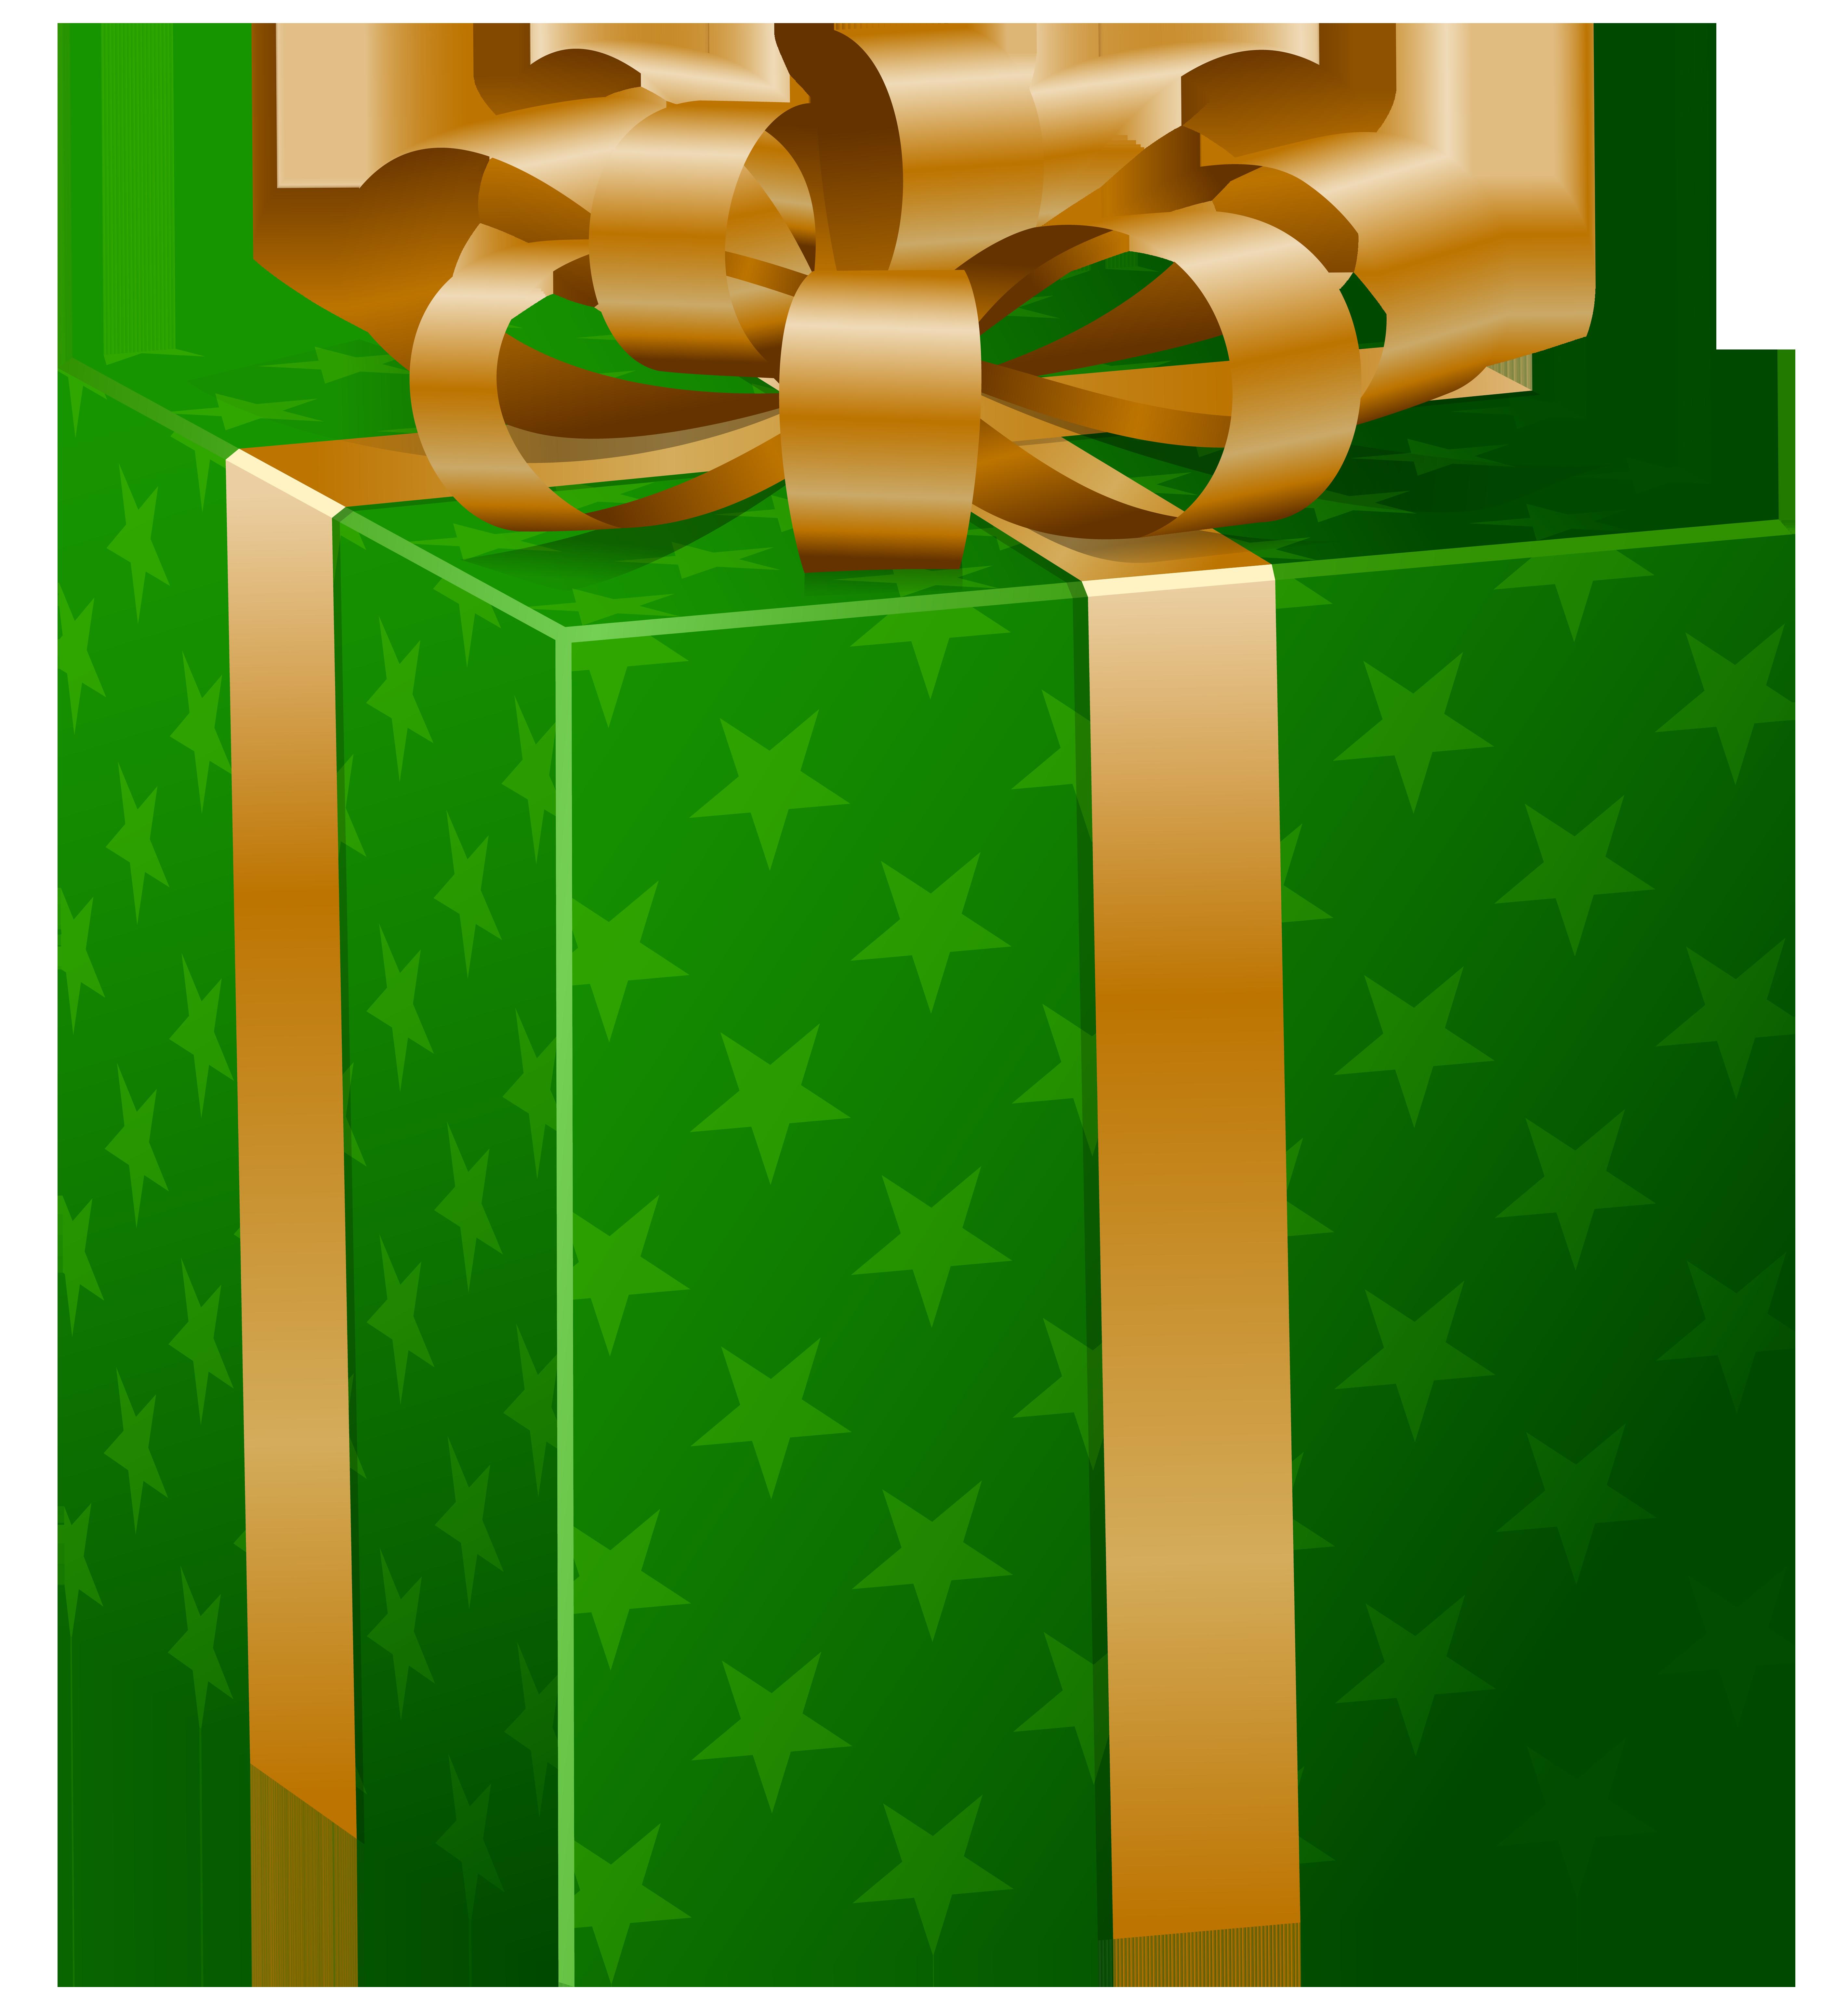 Green gift box photo